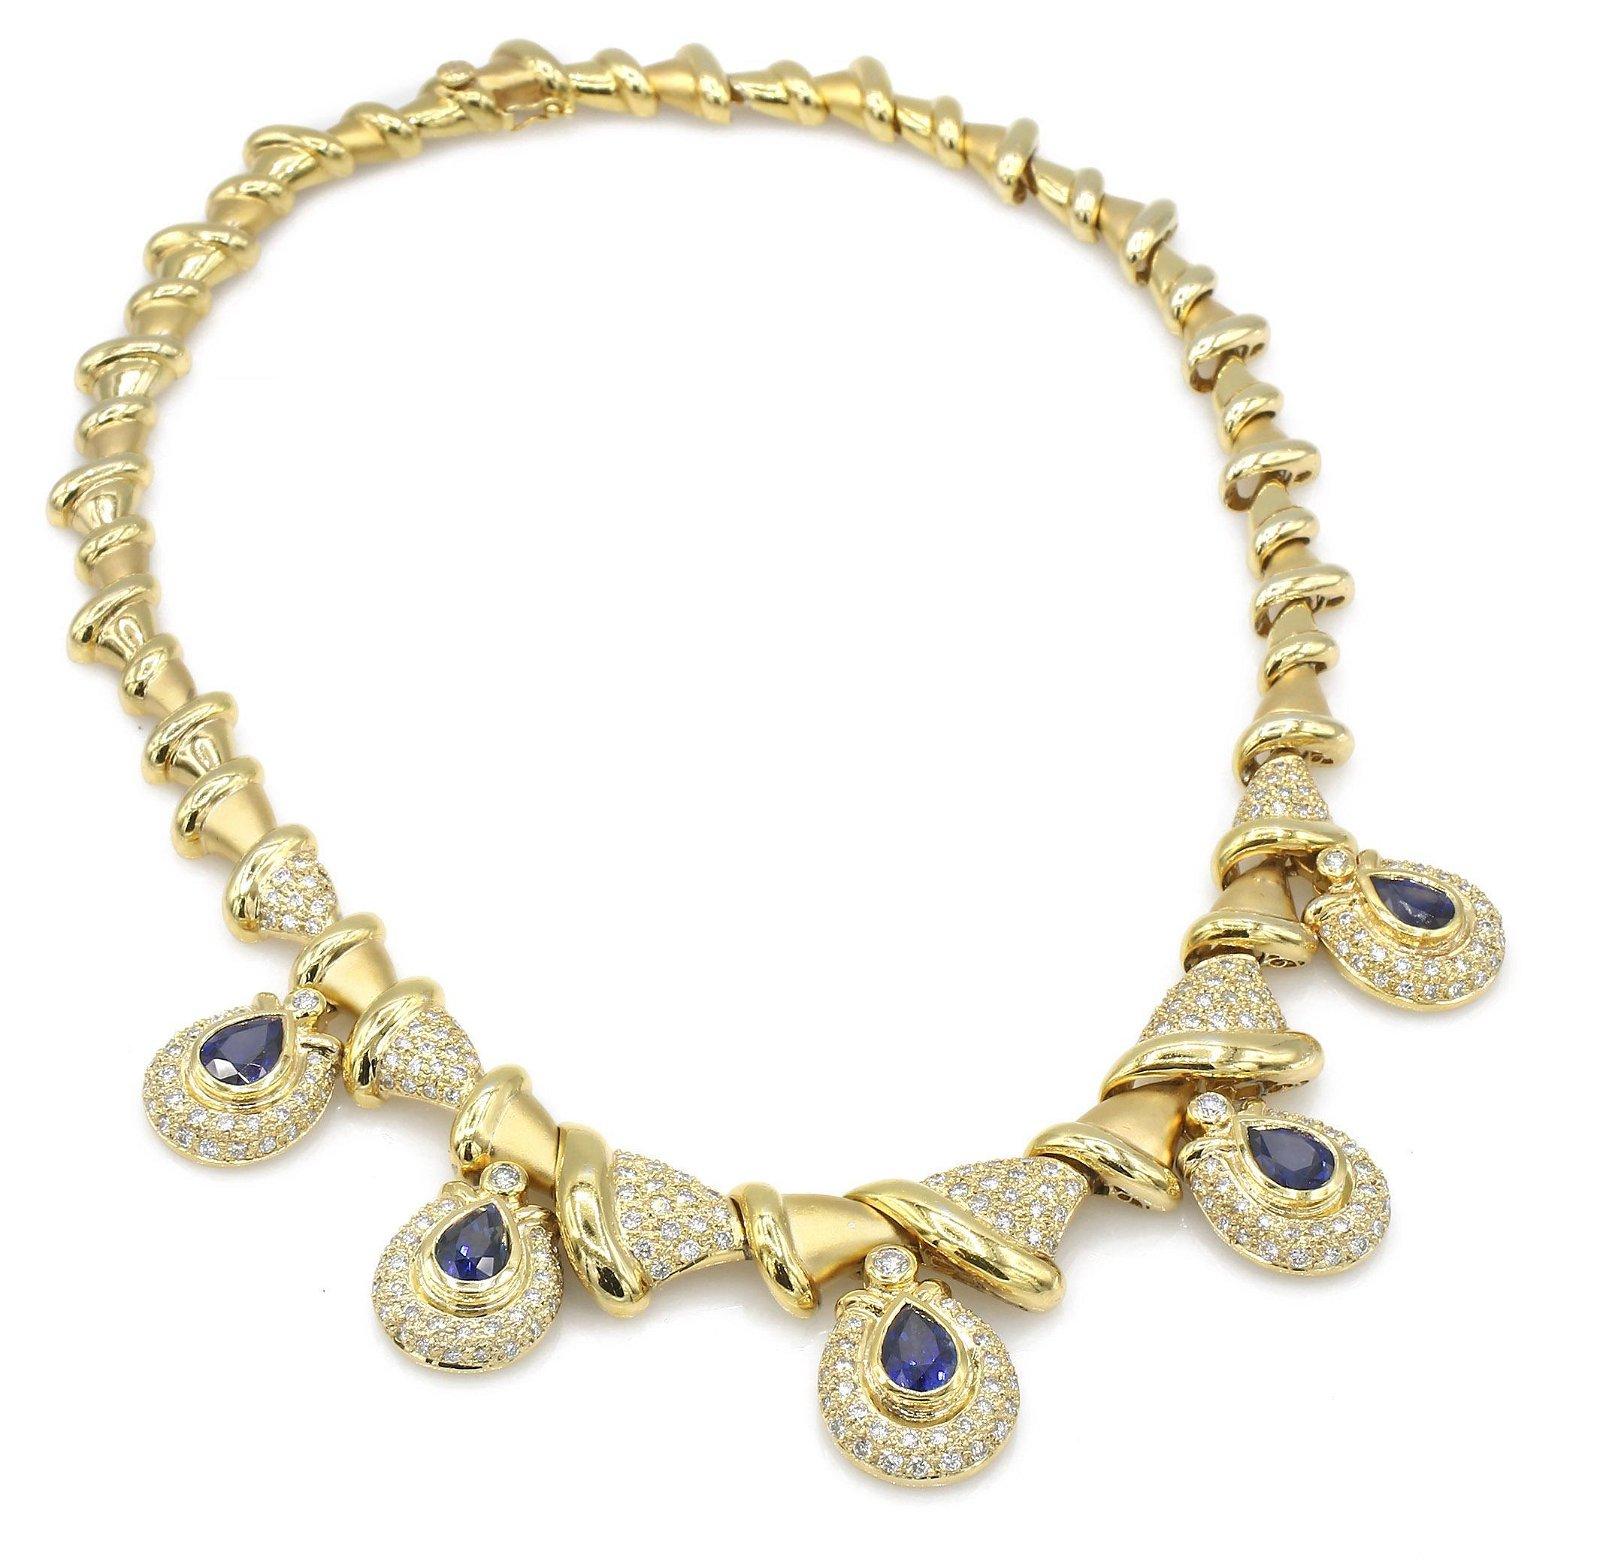 18K YG Pave Diamond and Sapphire Teardrop Necklace